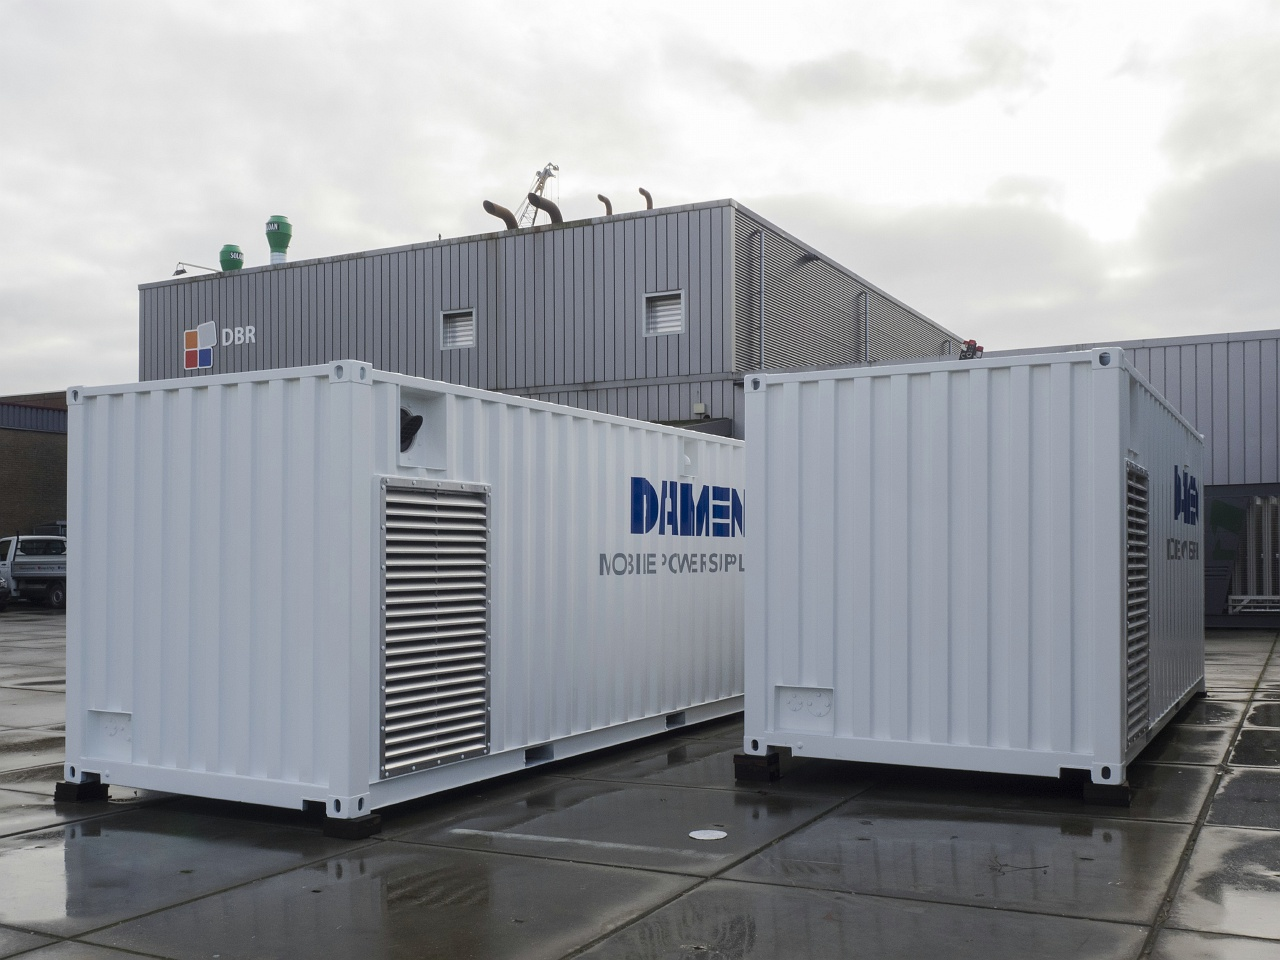 DBR awarded by Damen Shipyards to deliver standardized Mobile Power Supply